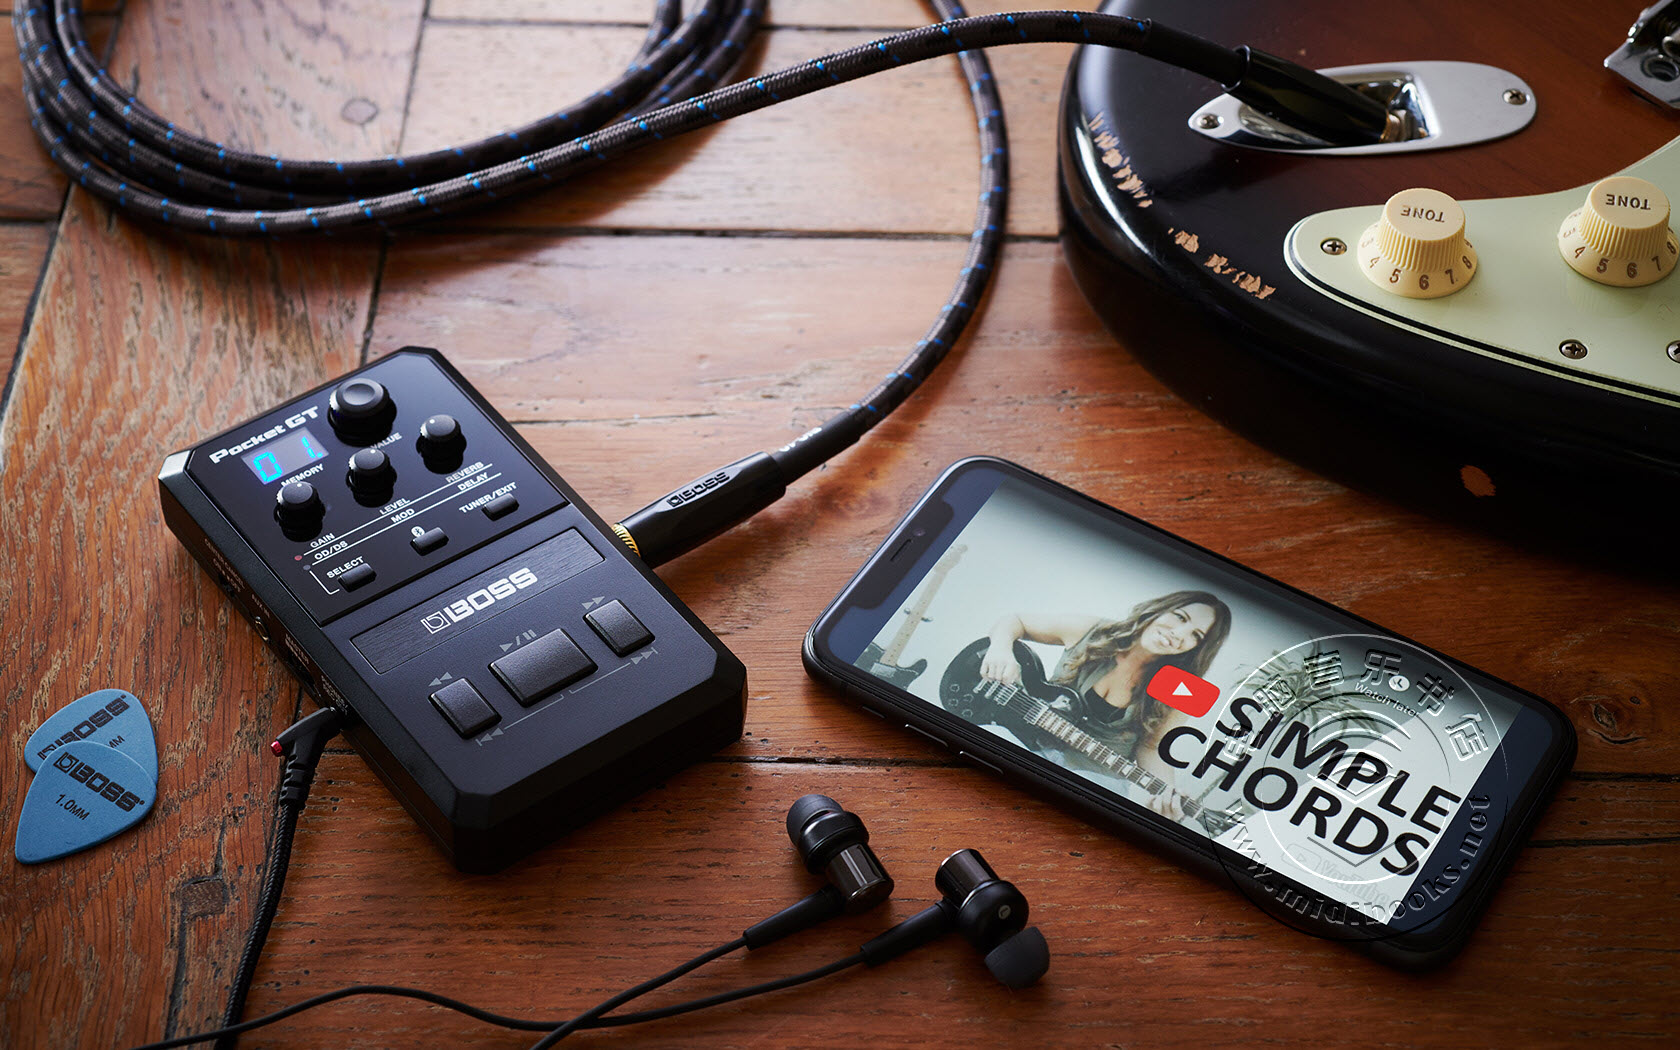 BOSS发布Pocket GT迷你吉他放大器和效果处理器,集成YouTube学习功能(视频)